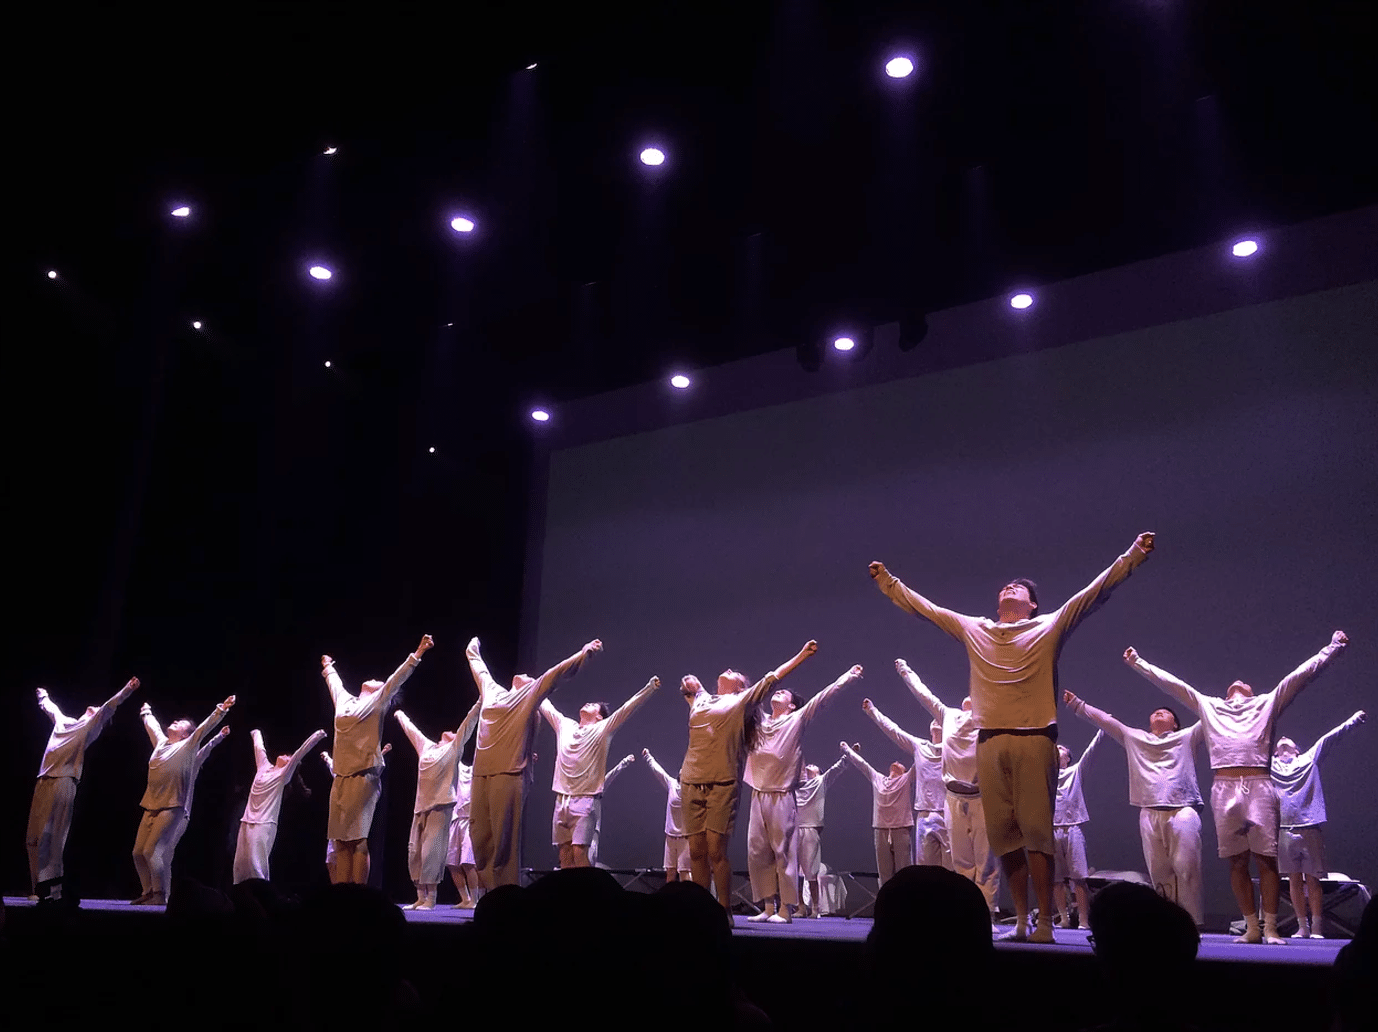 , Capture the Moment: Shooting Dance Performances